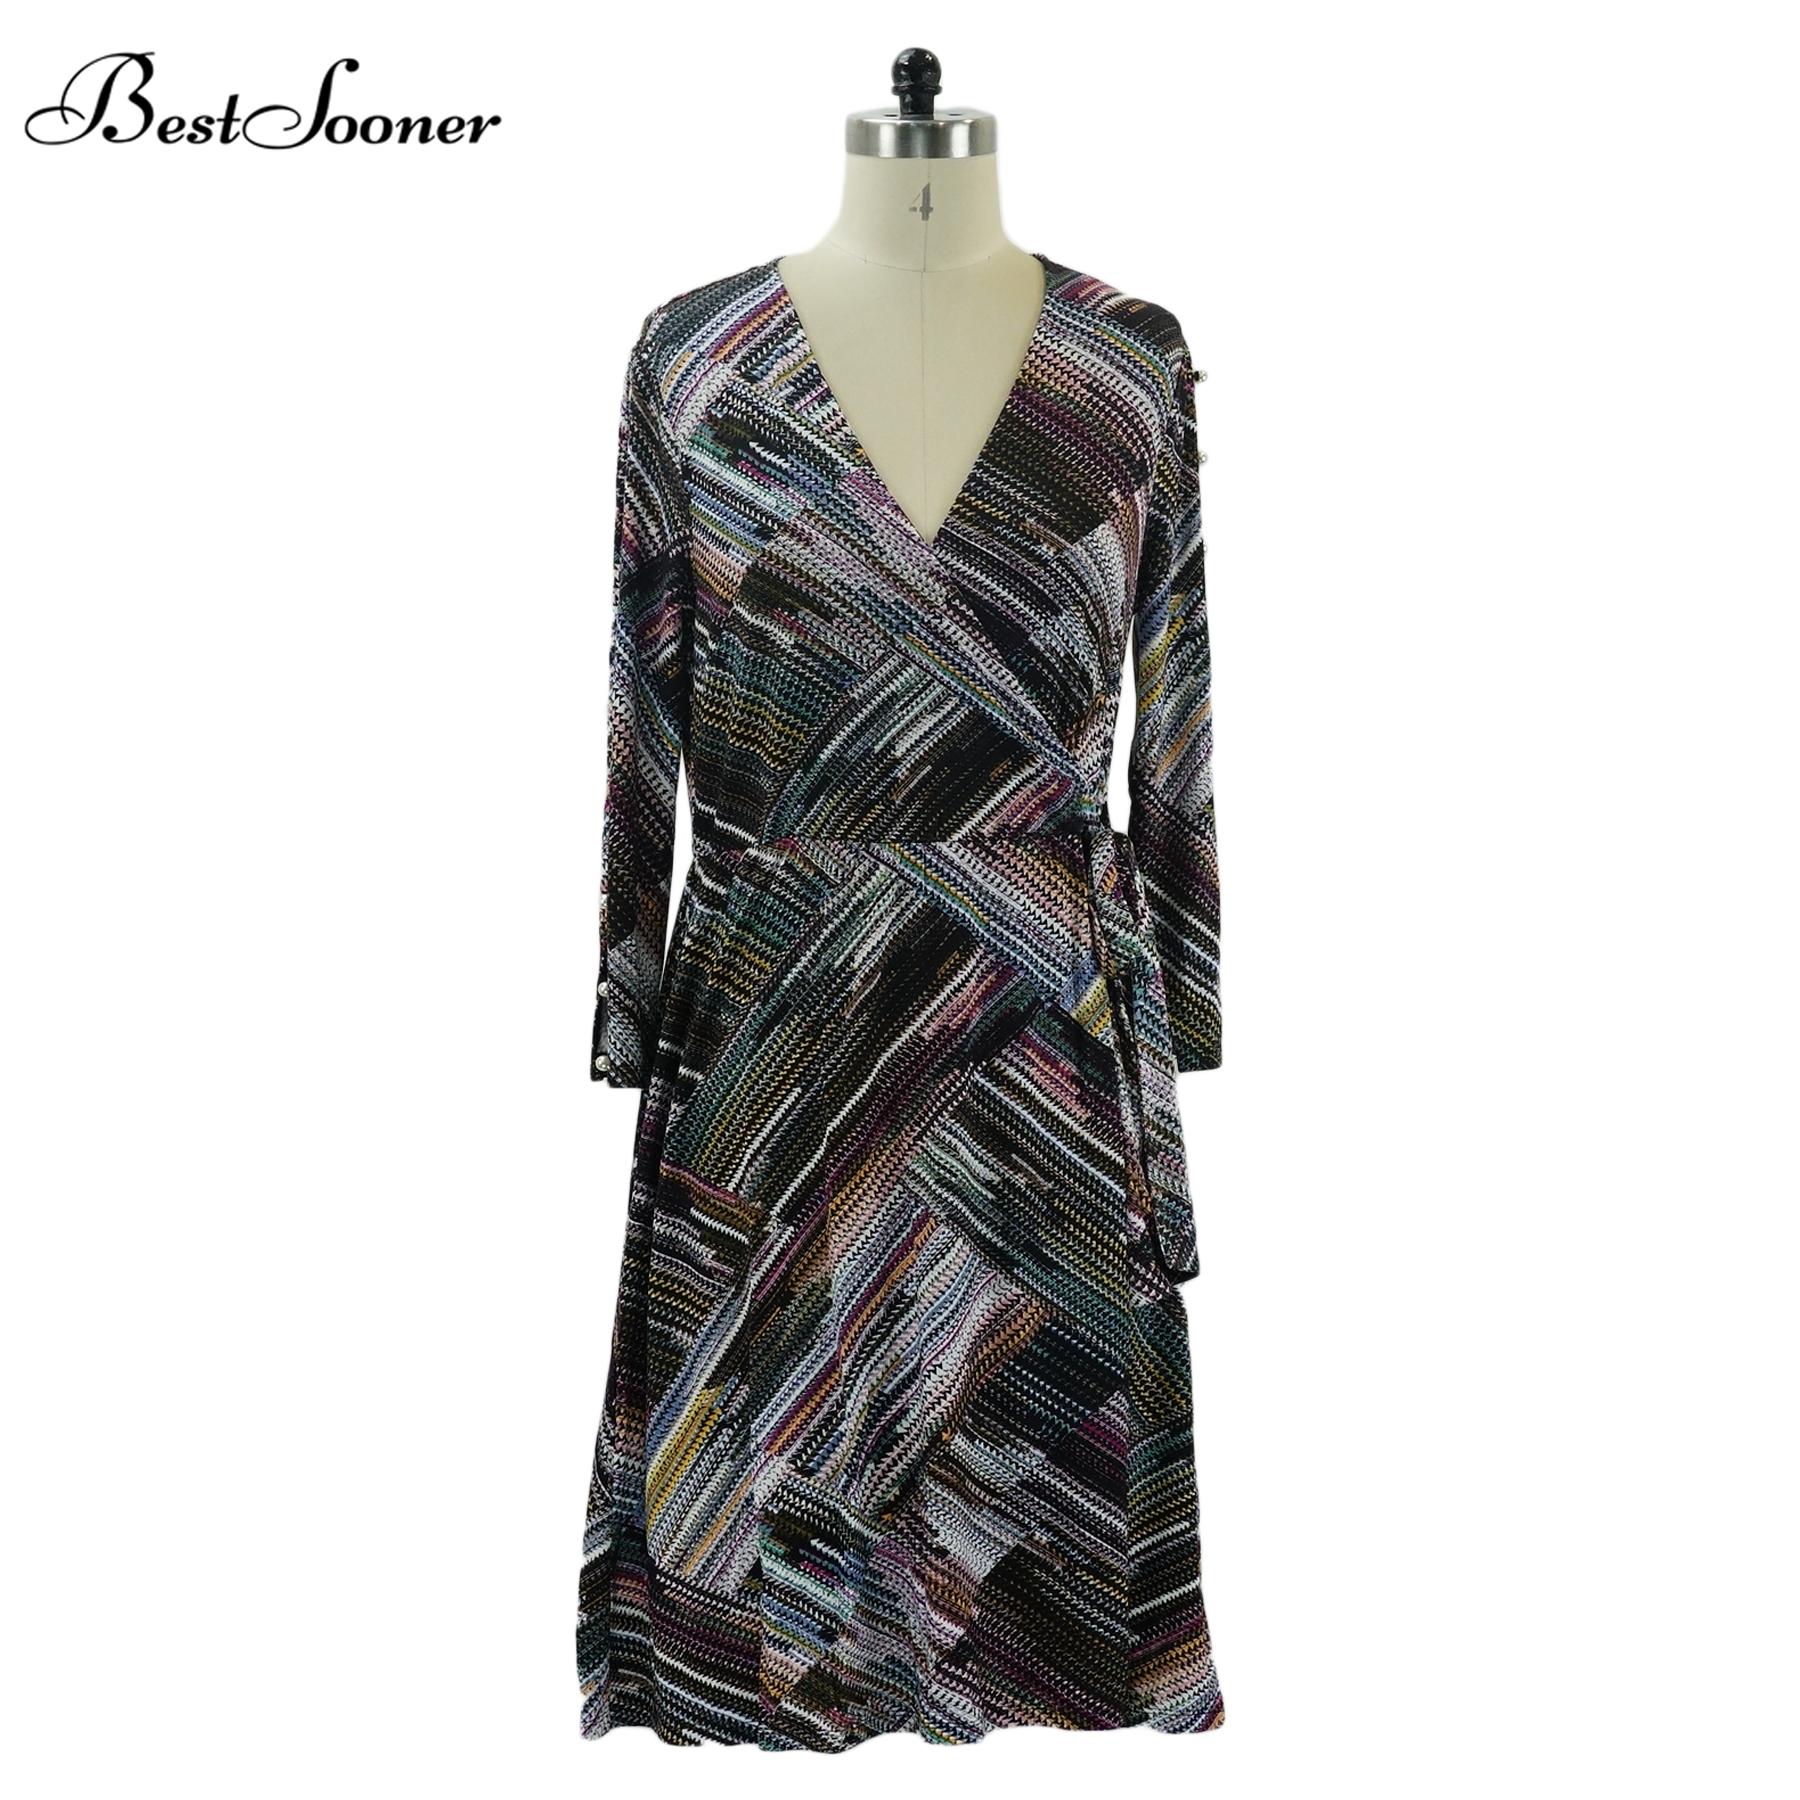 c3be81c3ebc4 Africa Unicorn Zebra Leopard Print Ethiopian Dress - Buy Africa ...